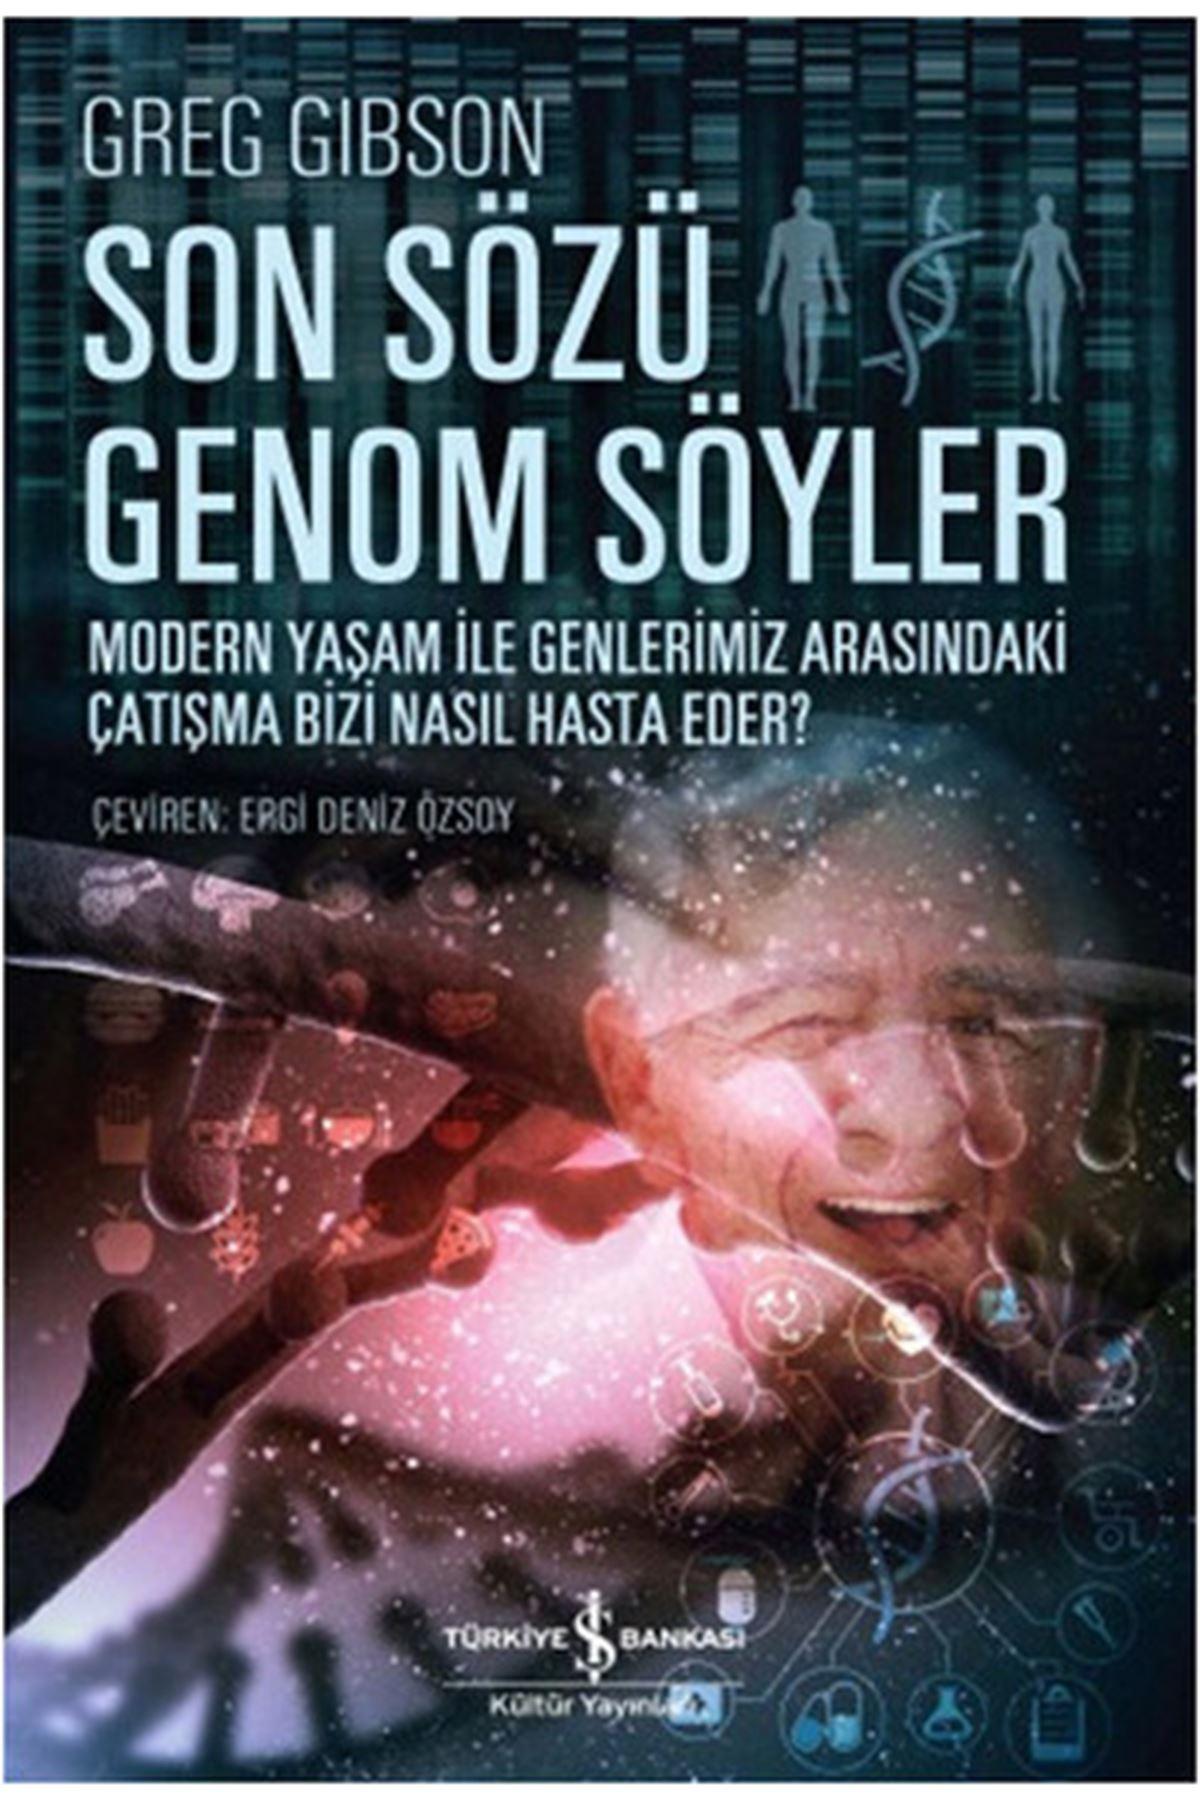 GREG GIBSON - SON SÖZÜ GENOM SÖYLER